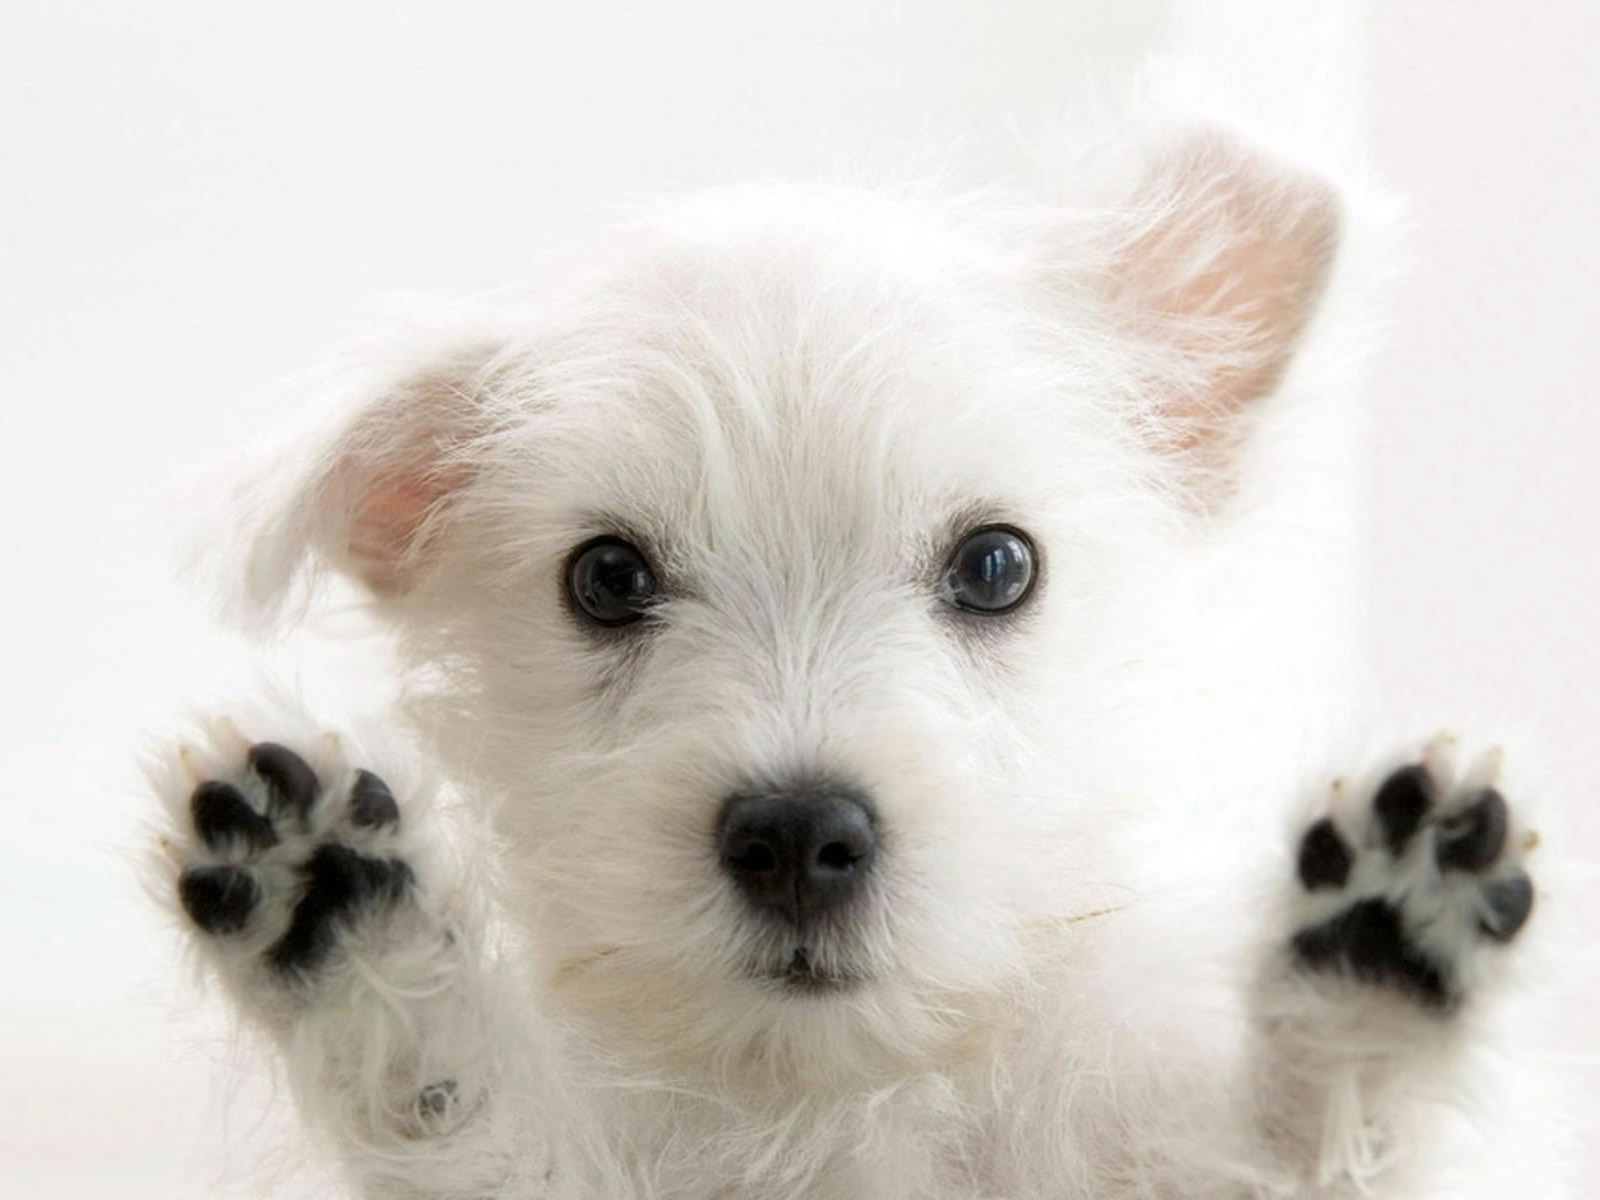 View Cute Little White Dog wallpaper Download Cute Little White Dog 1600x1200